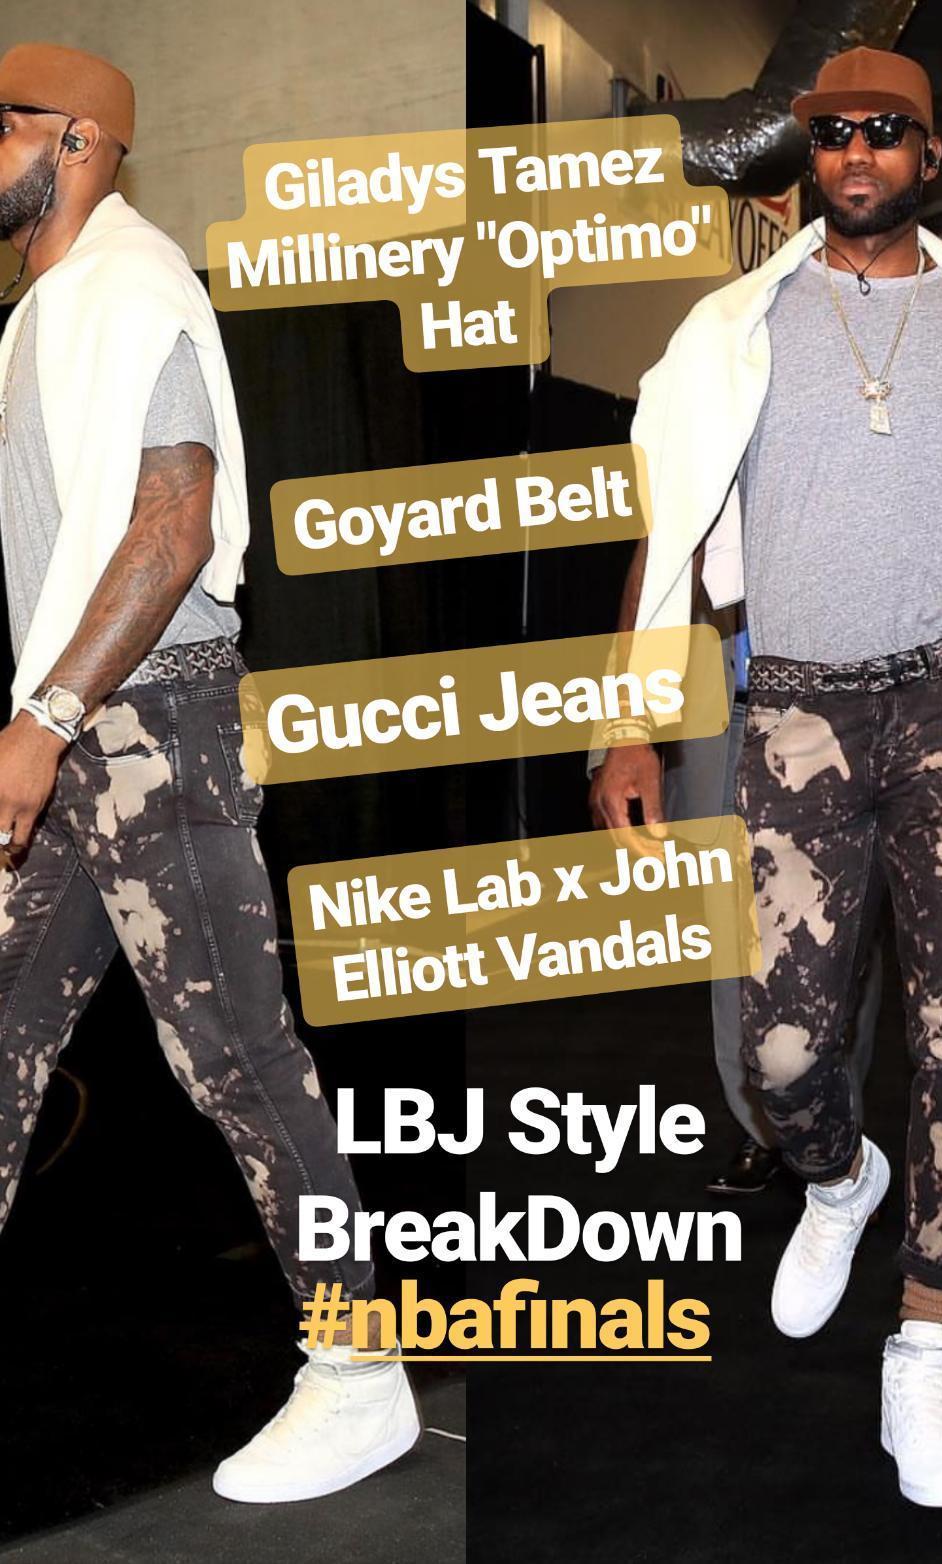 Lebron James' 2017 NBA Finals Gucci Bleached Jeans, Giladys Tamez Millinery Hat, & Nike x John Elliott Vandal Sneakers